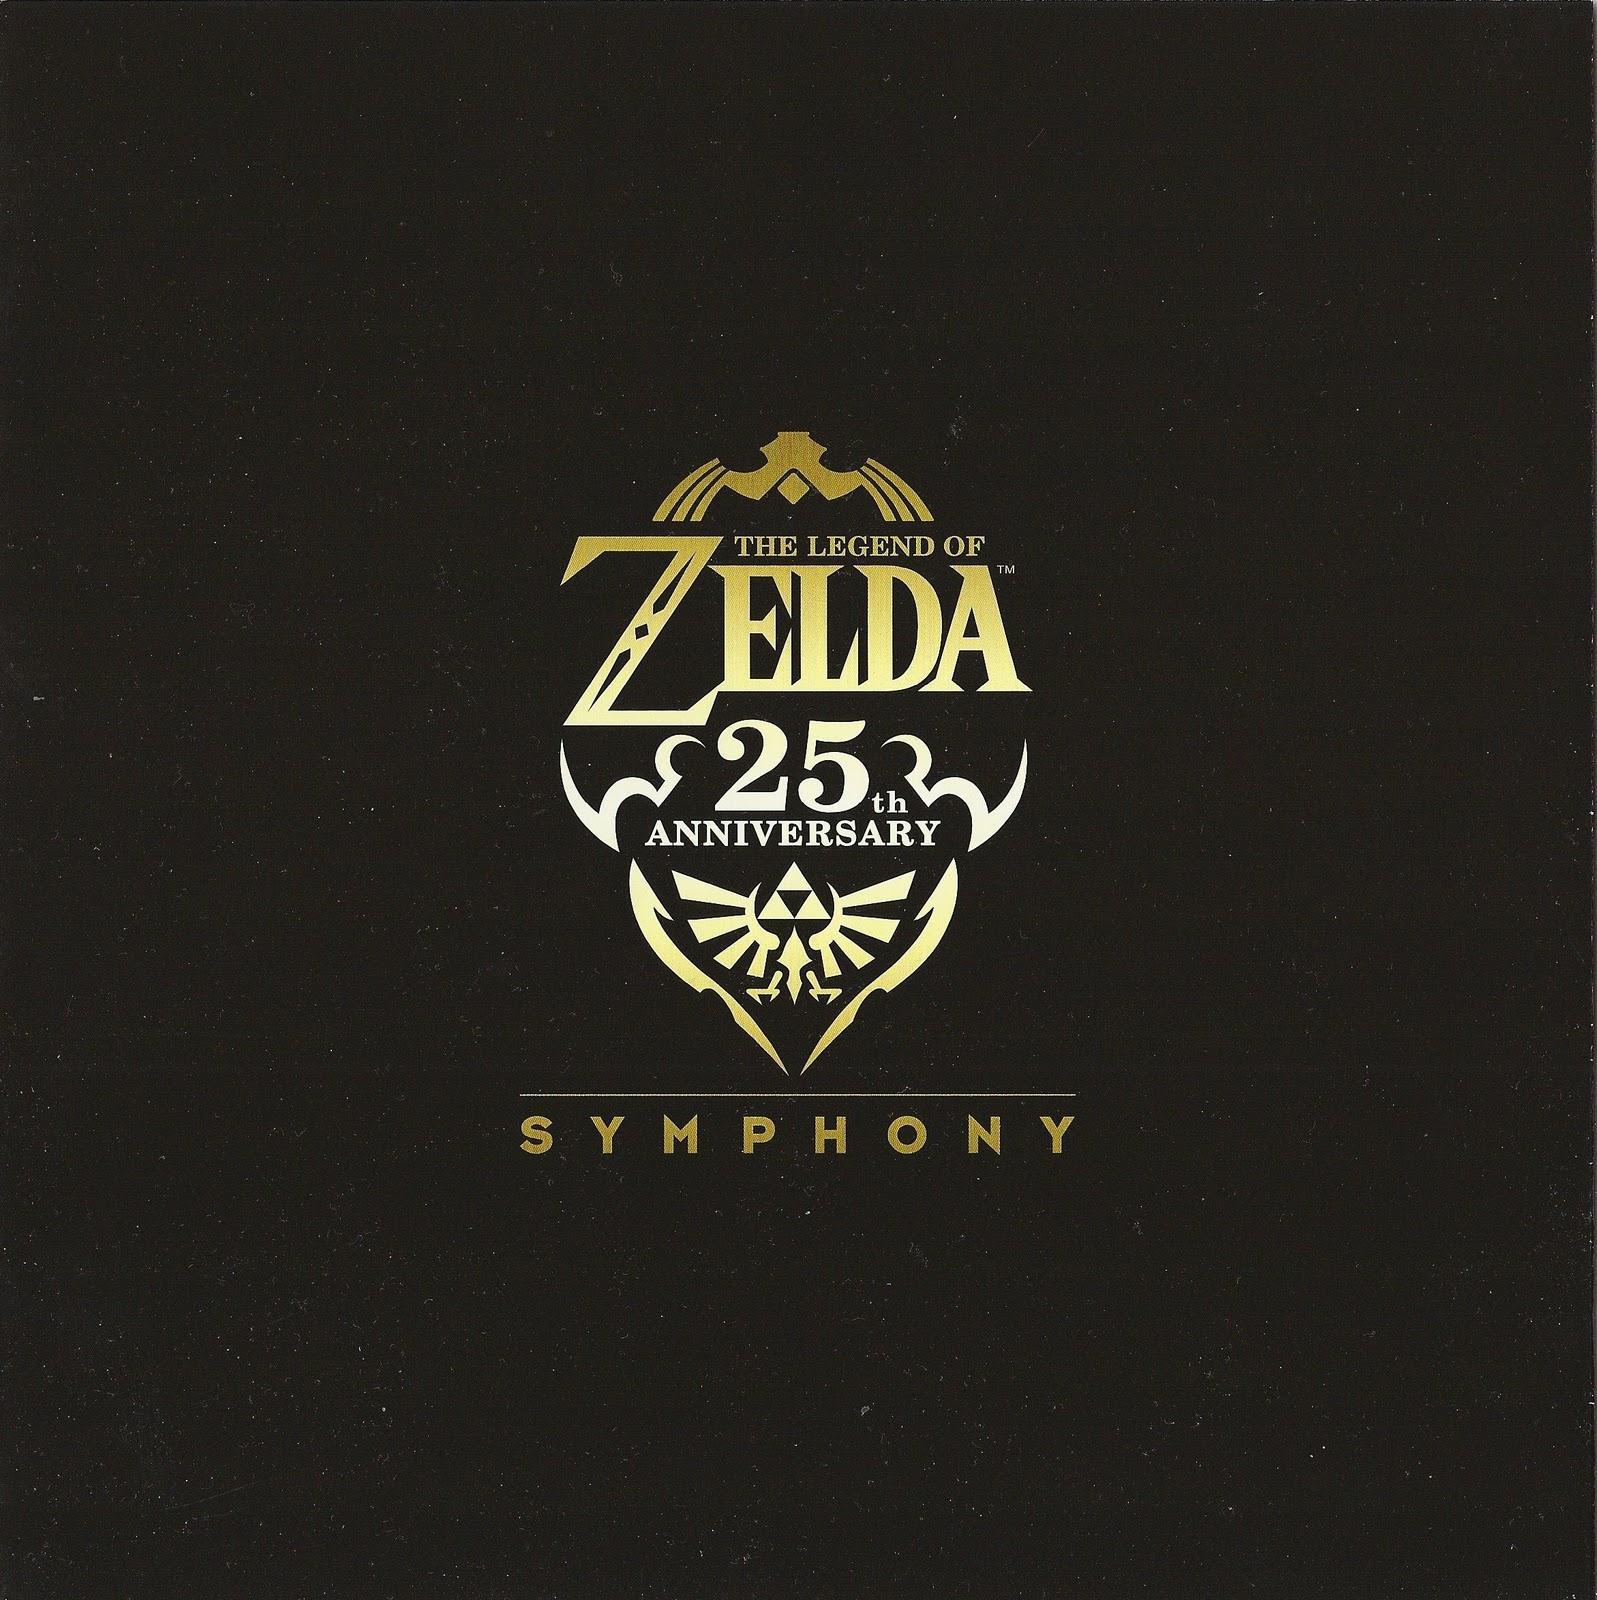 Legend of zelda 25th anniversary